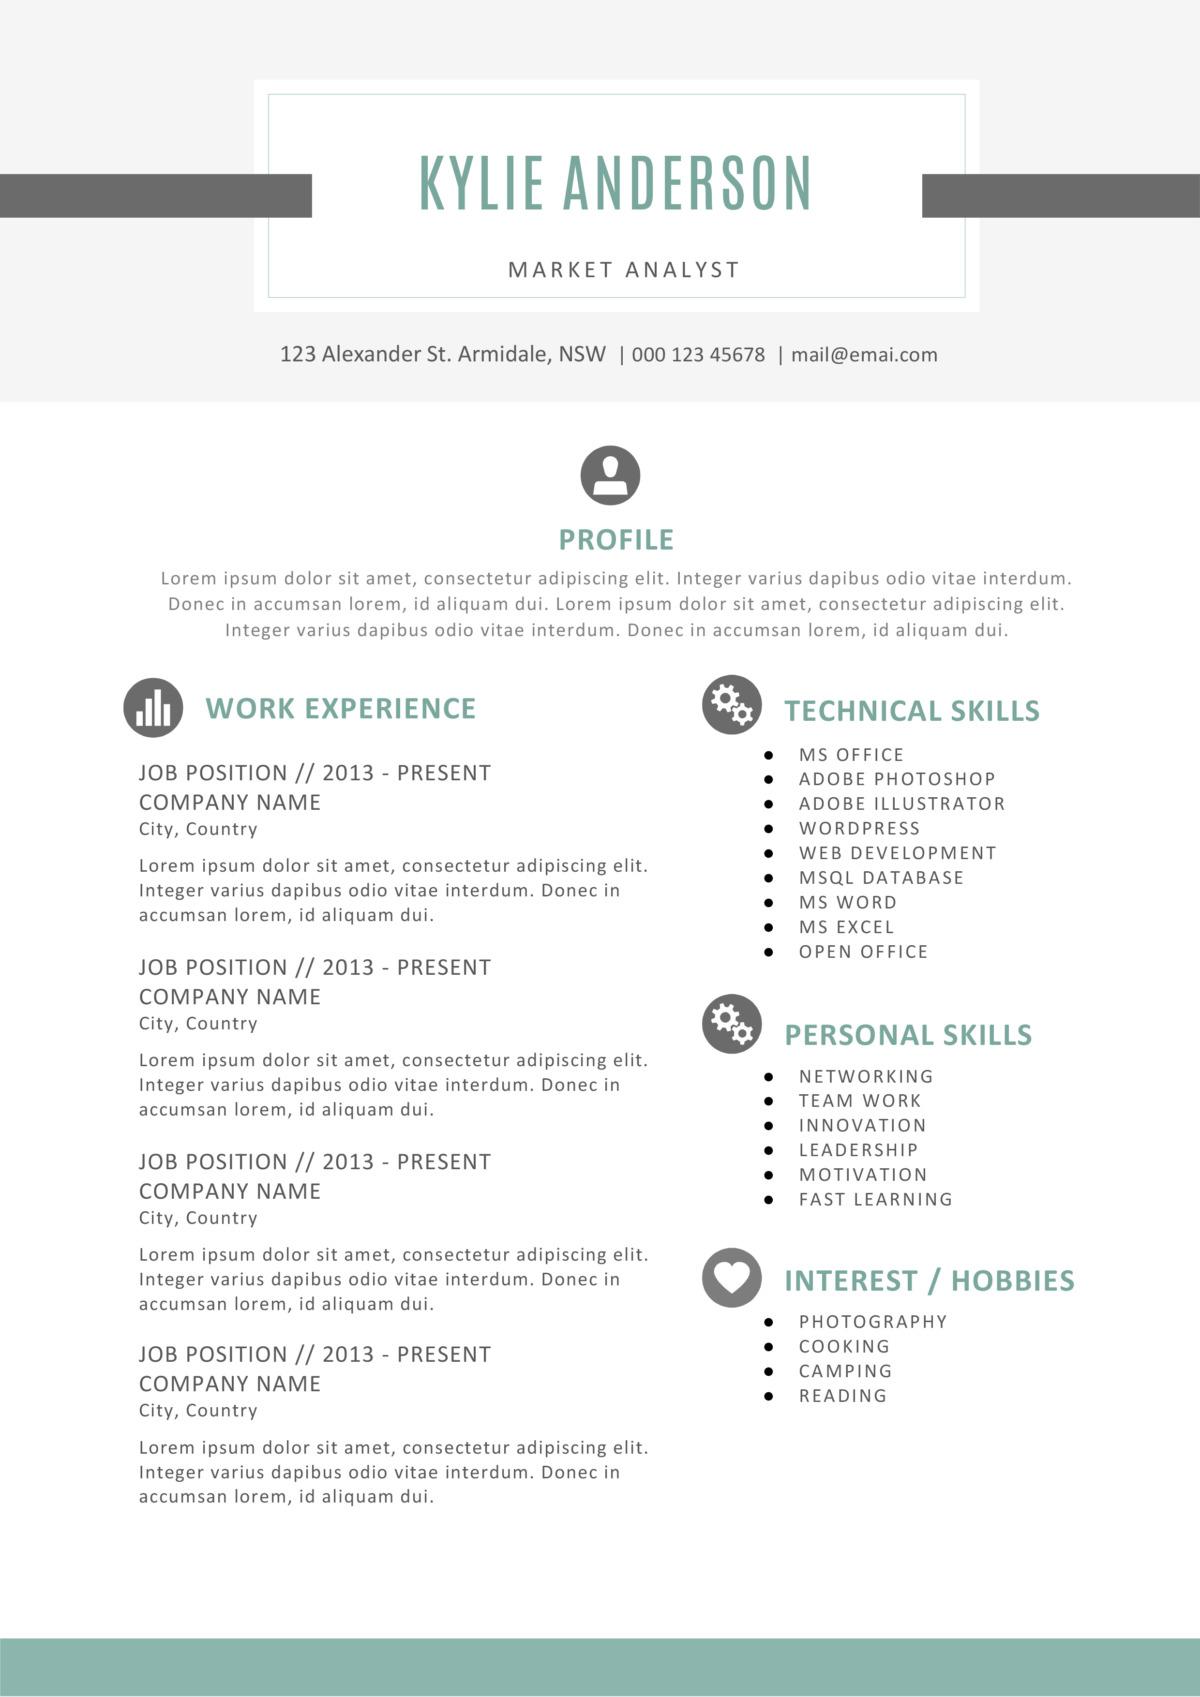 Resume Soft Copy Soft Skills Resume Resume Soft Copy Format